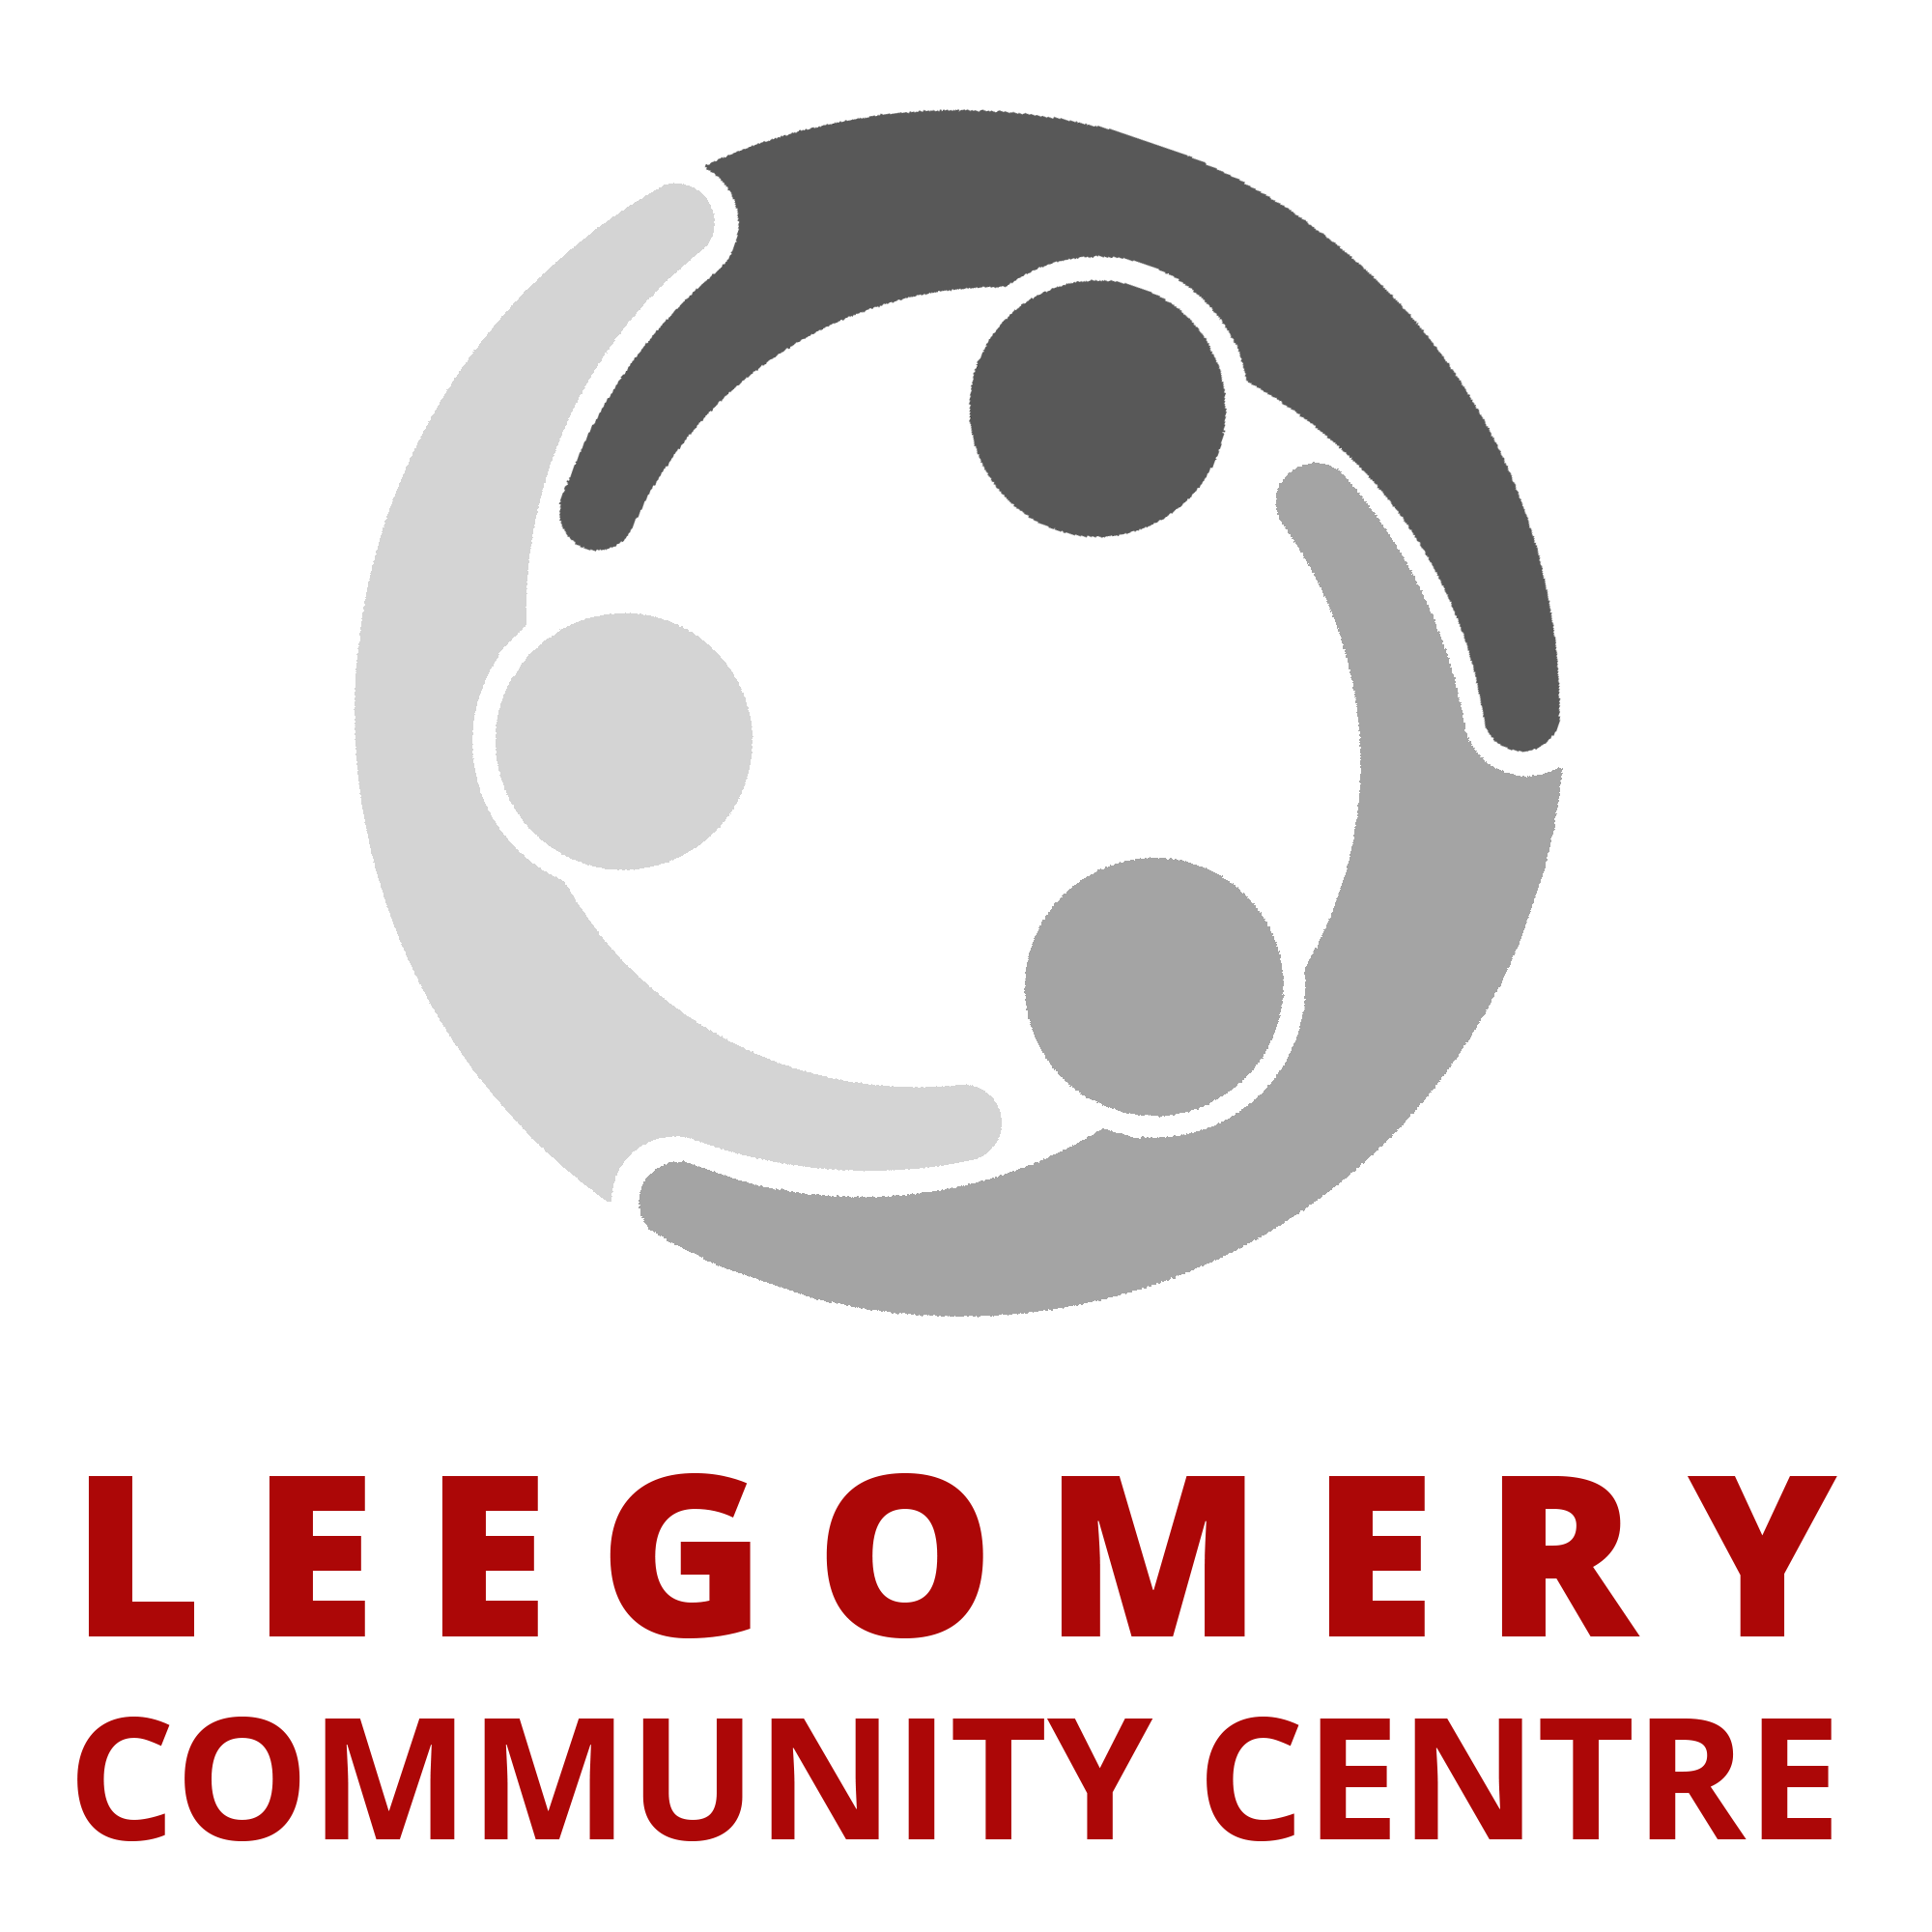 Leegomery Community Centre